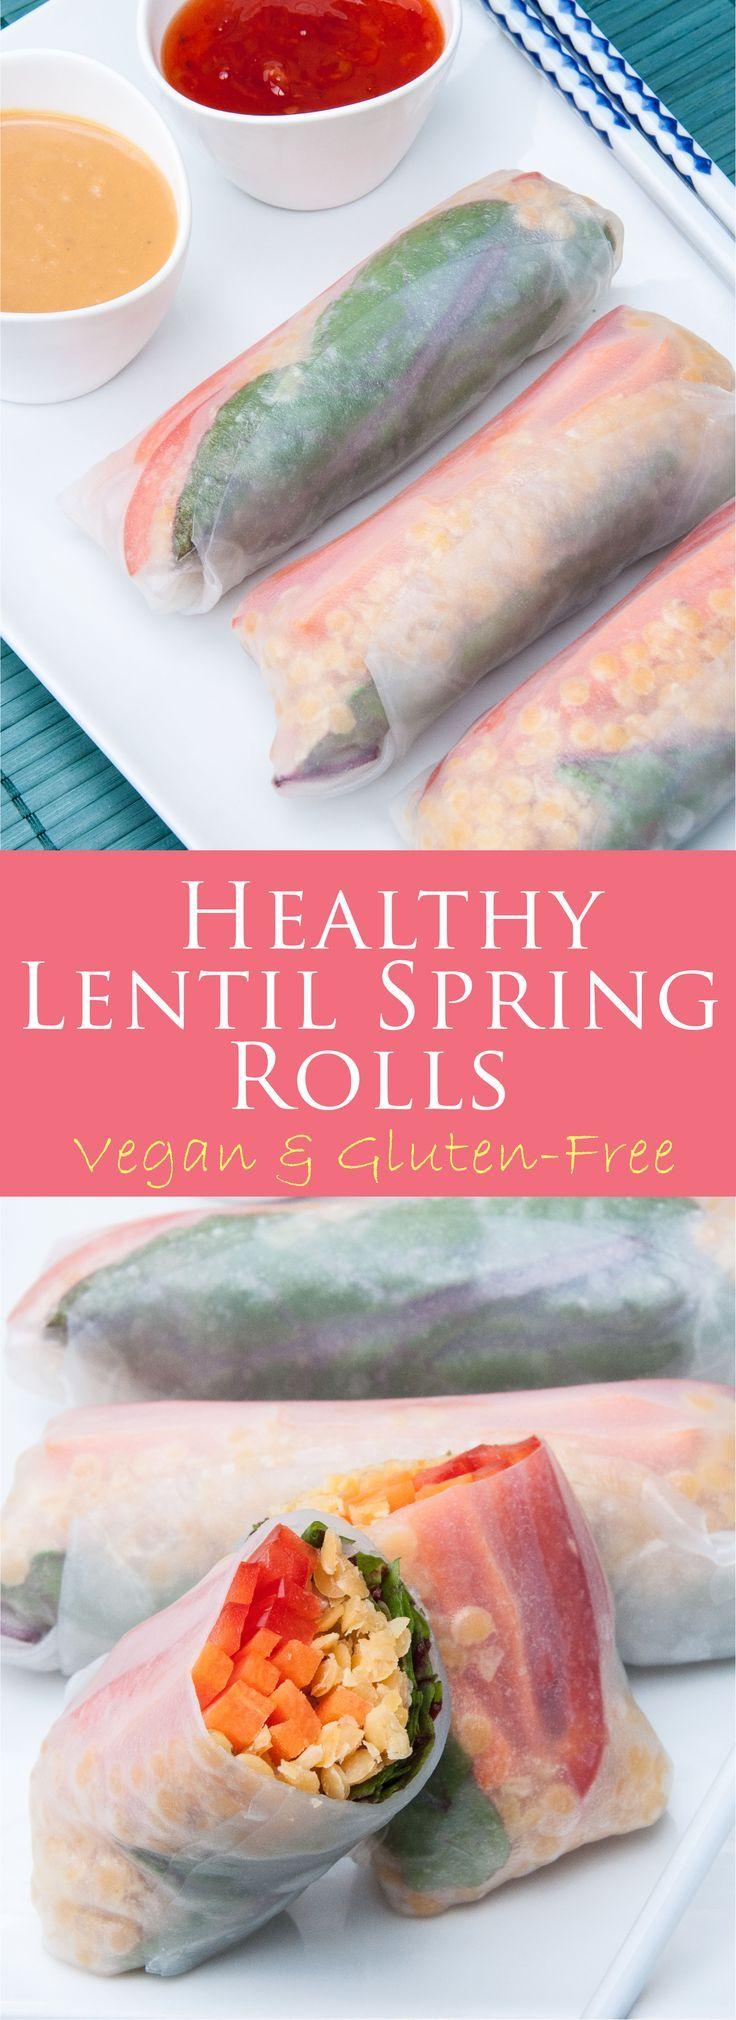 healthy red lentil spring rolls | vegan, vegetarian, clean-eating, gluten-free, appetizer, rice paper